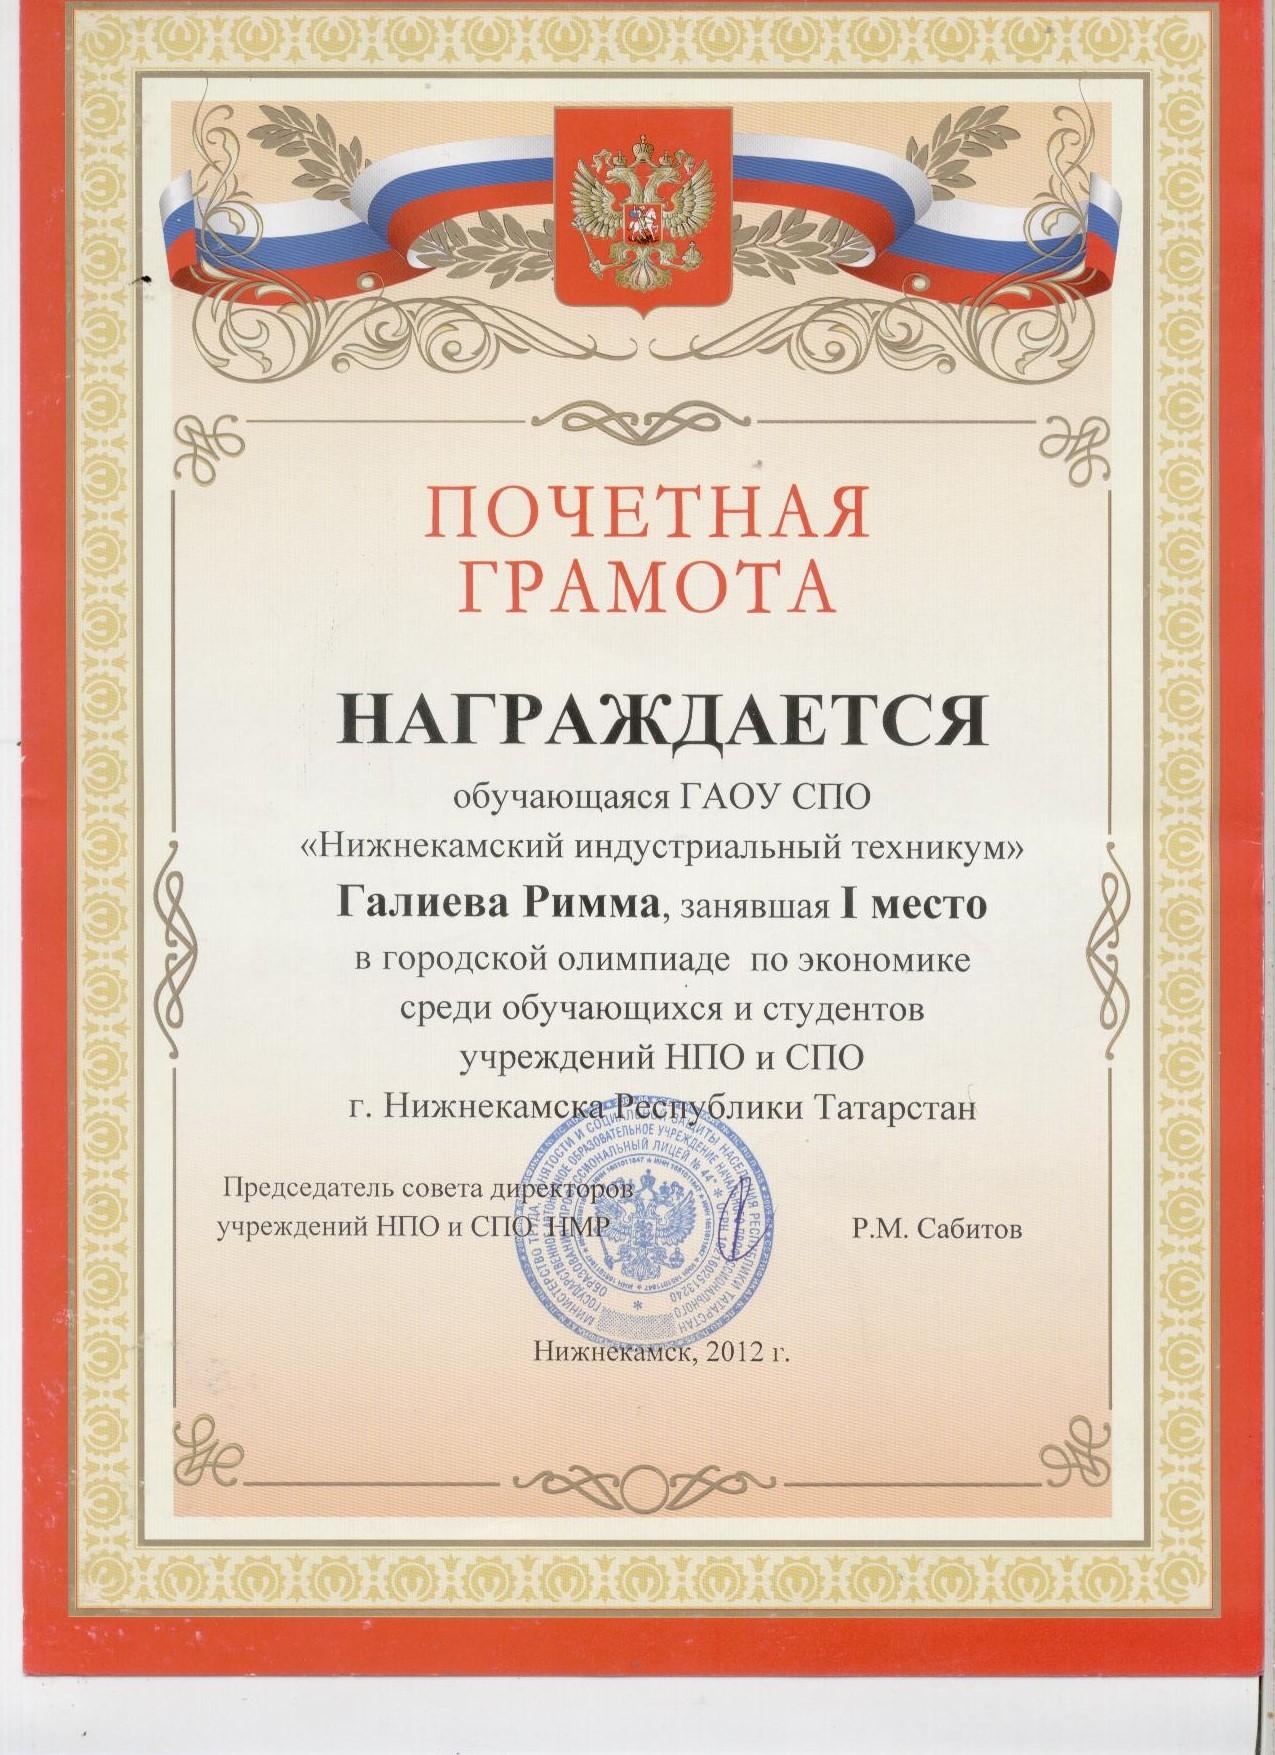 F:\Всероссйский конкурс Портфолио выпускника\РИММА\Римма 026.jpg